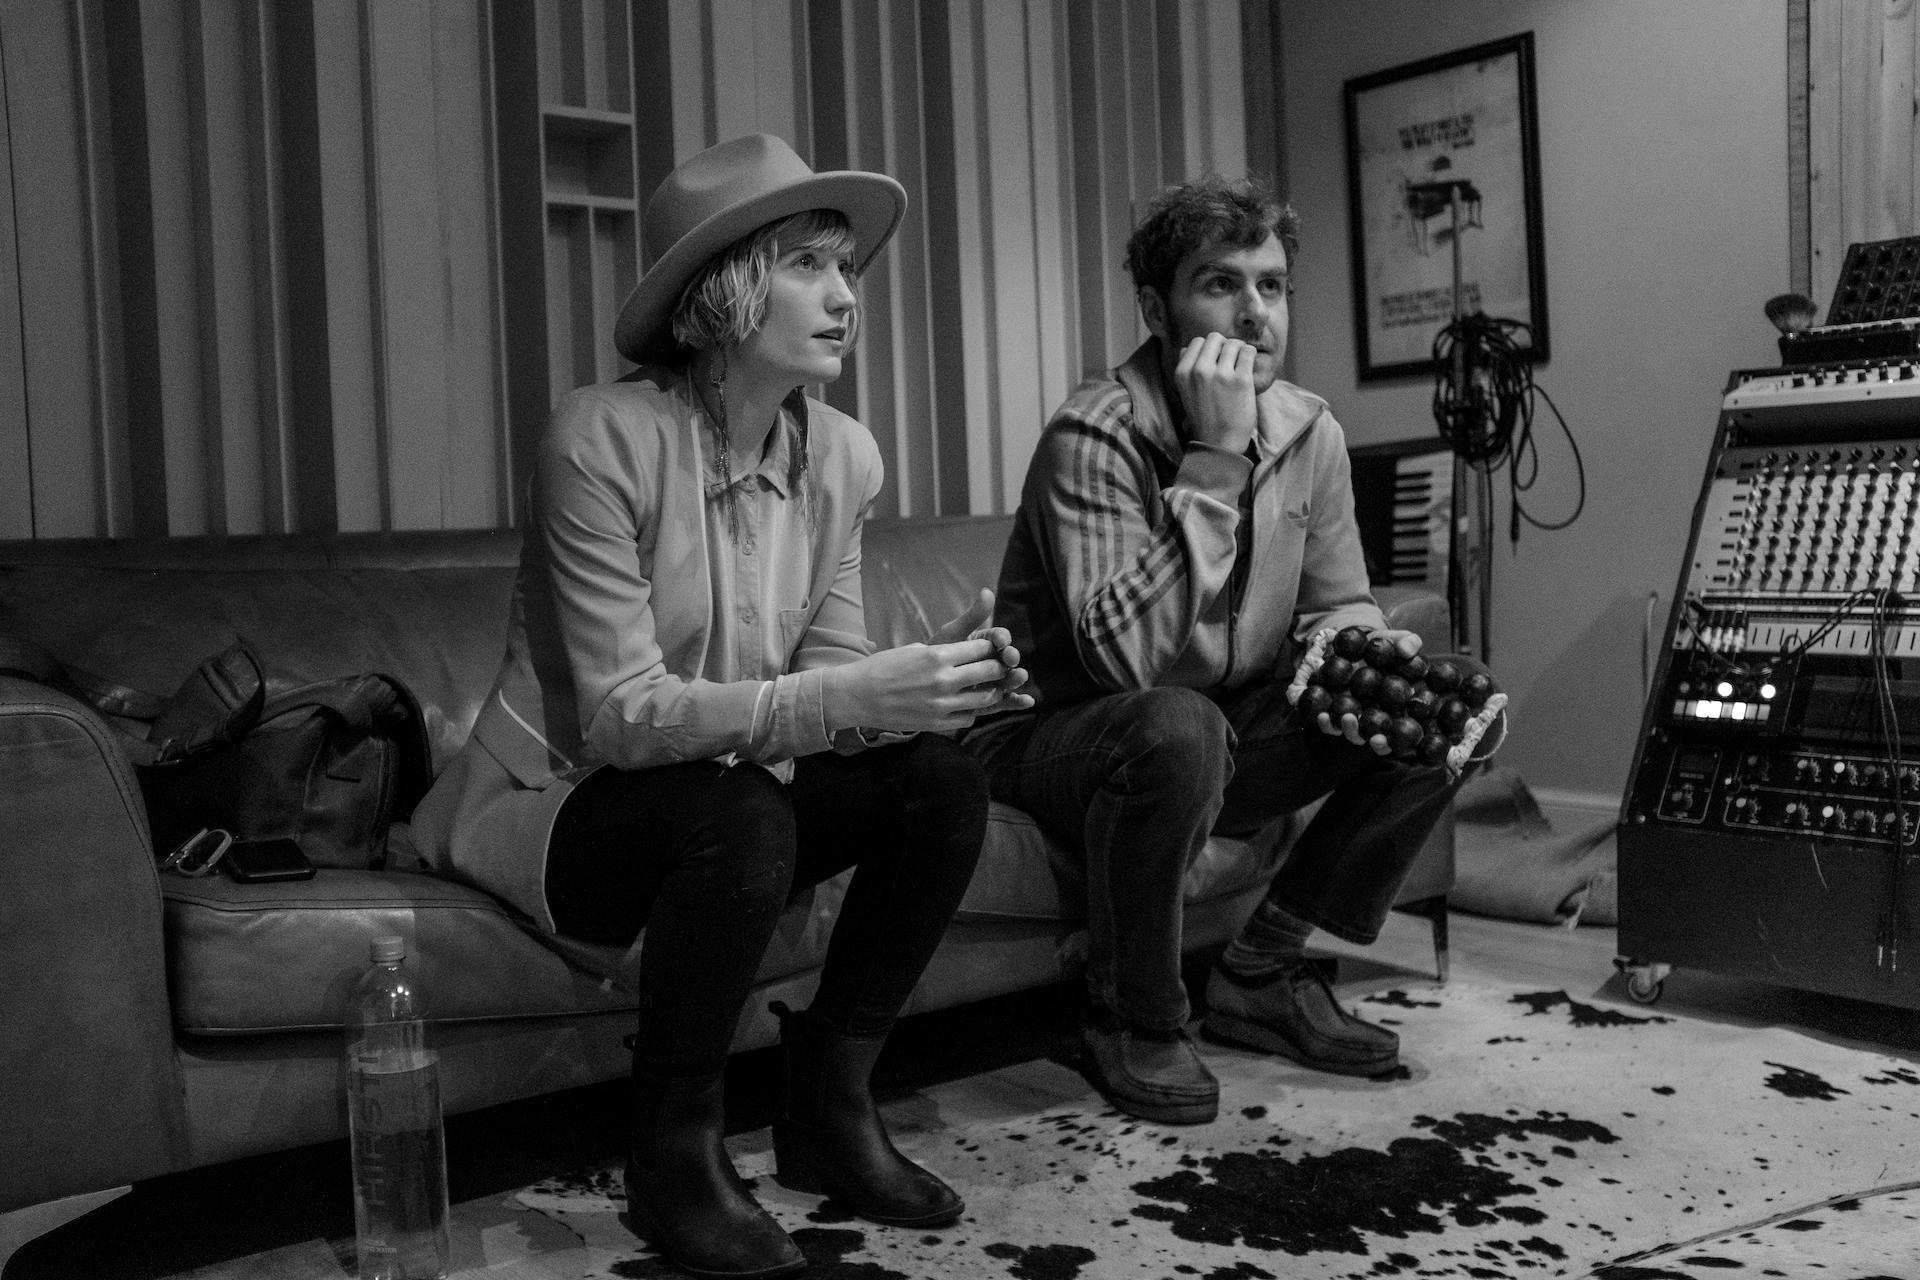 Husband and wife musician-artists Dan Bakkes and Brendon Erasmus